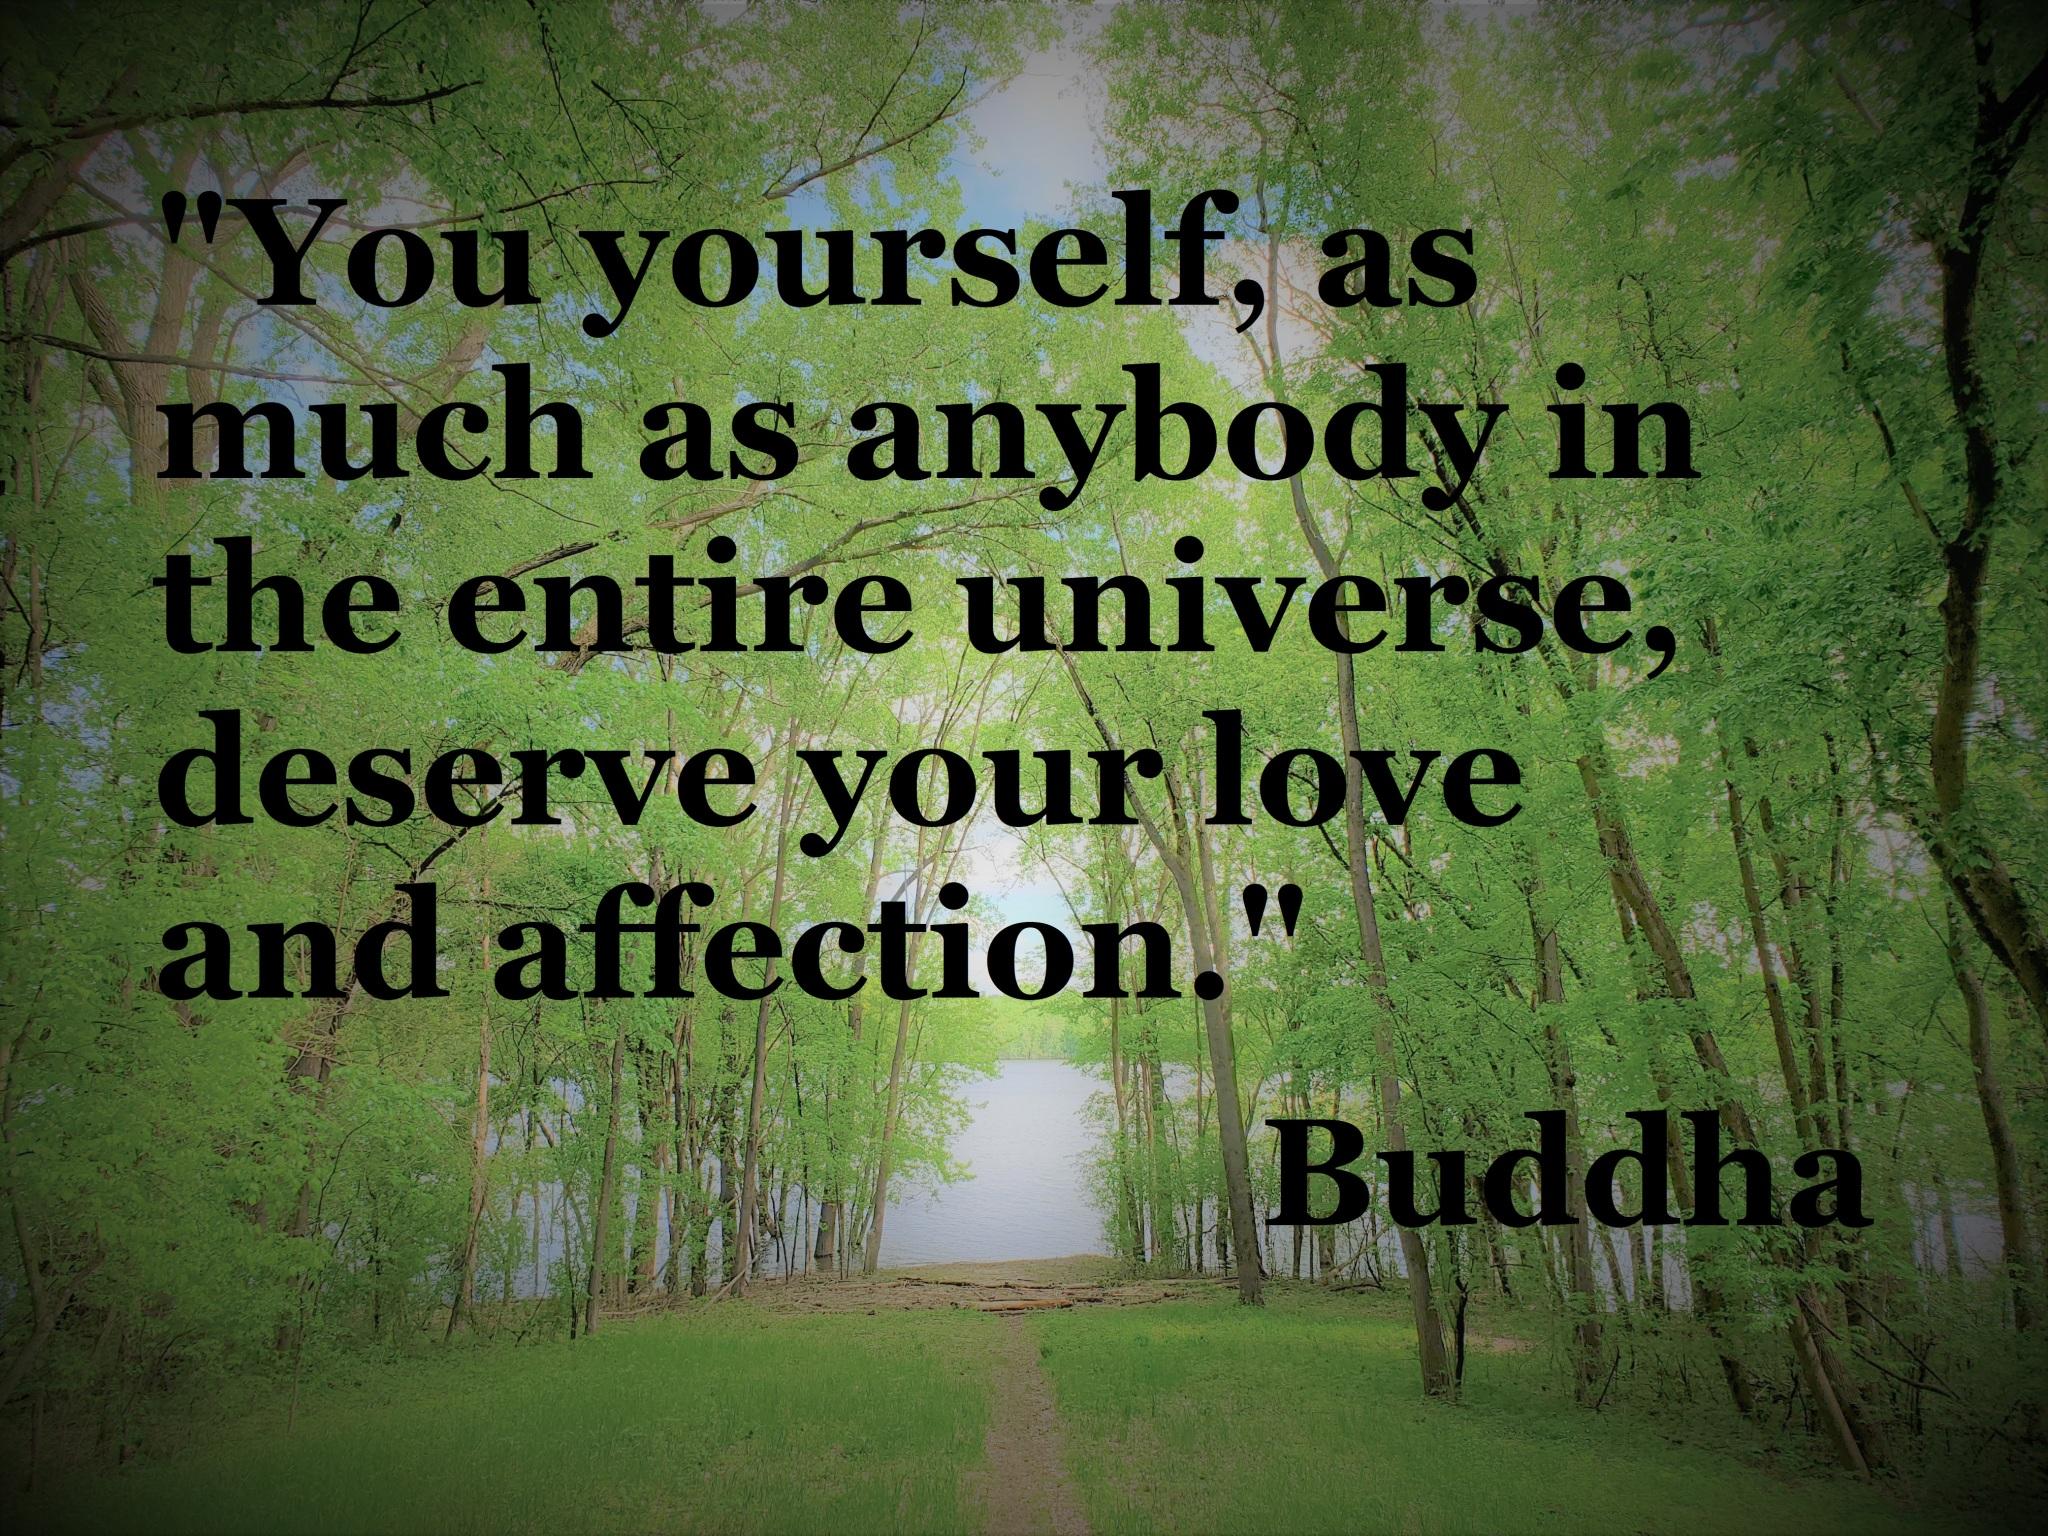 Buddha - you deserve your love